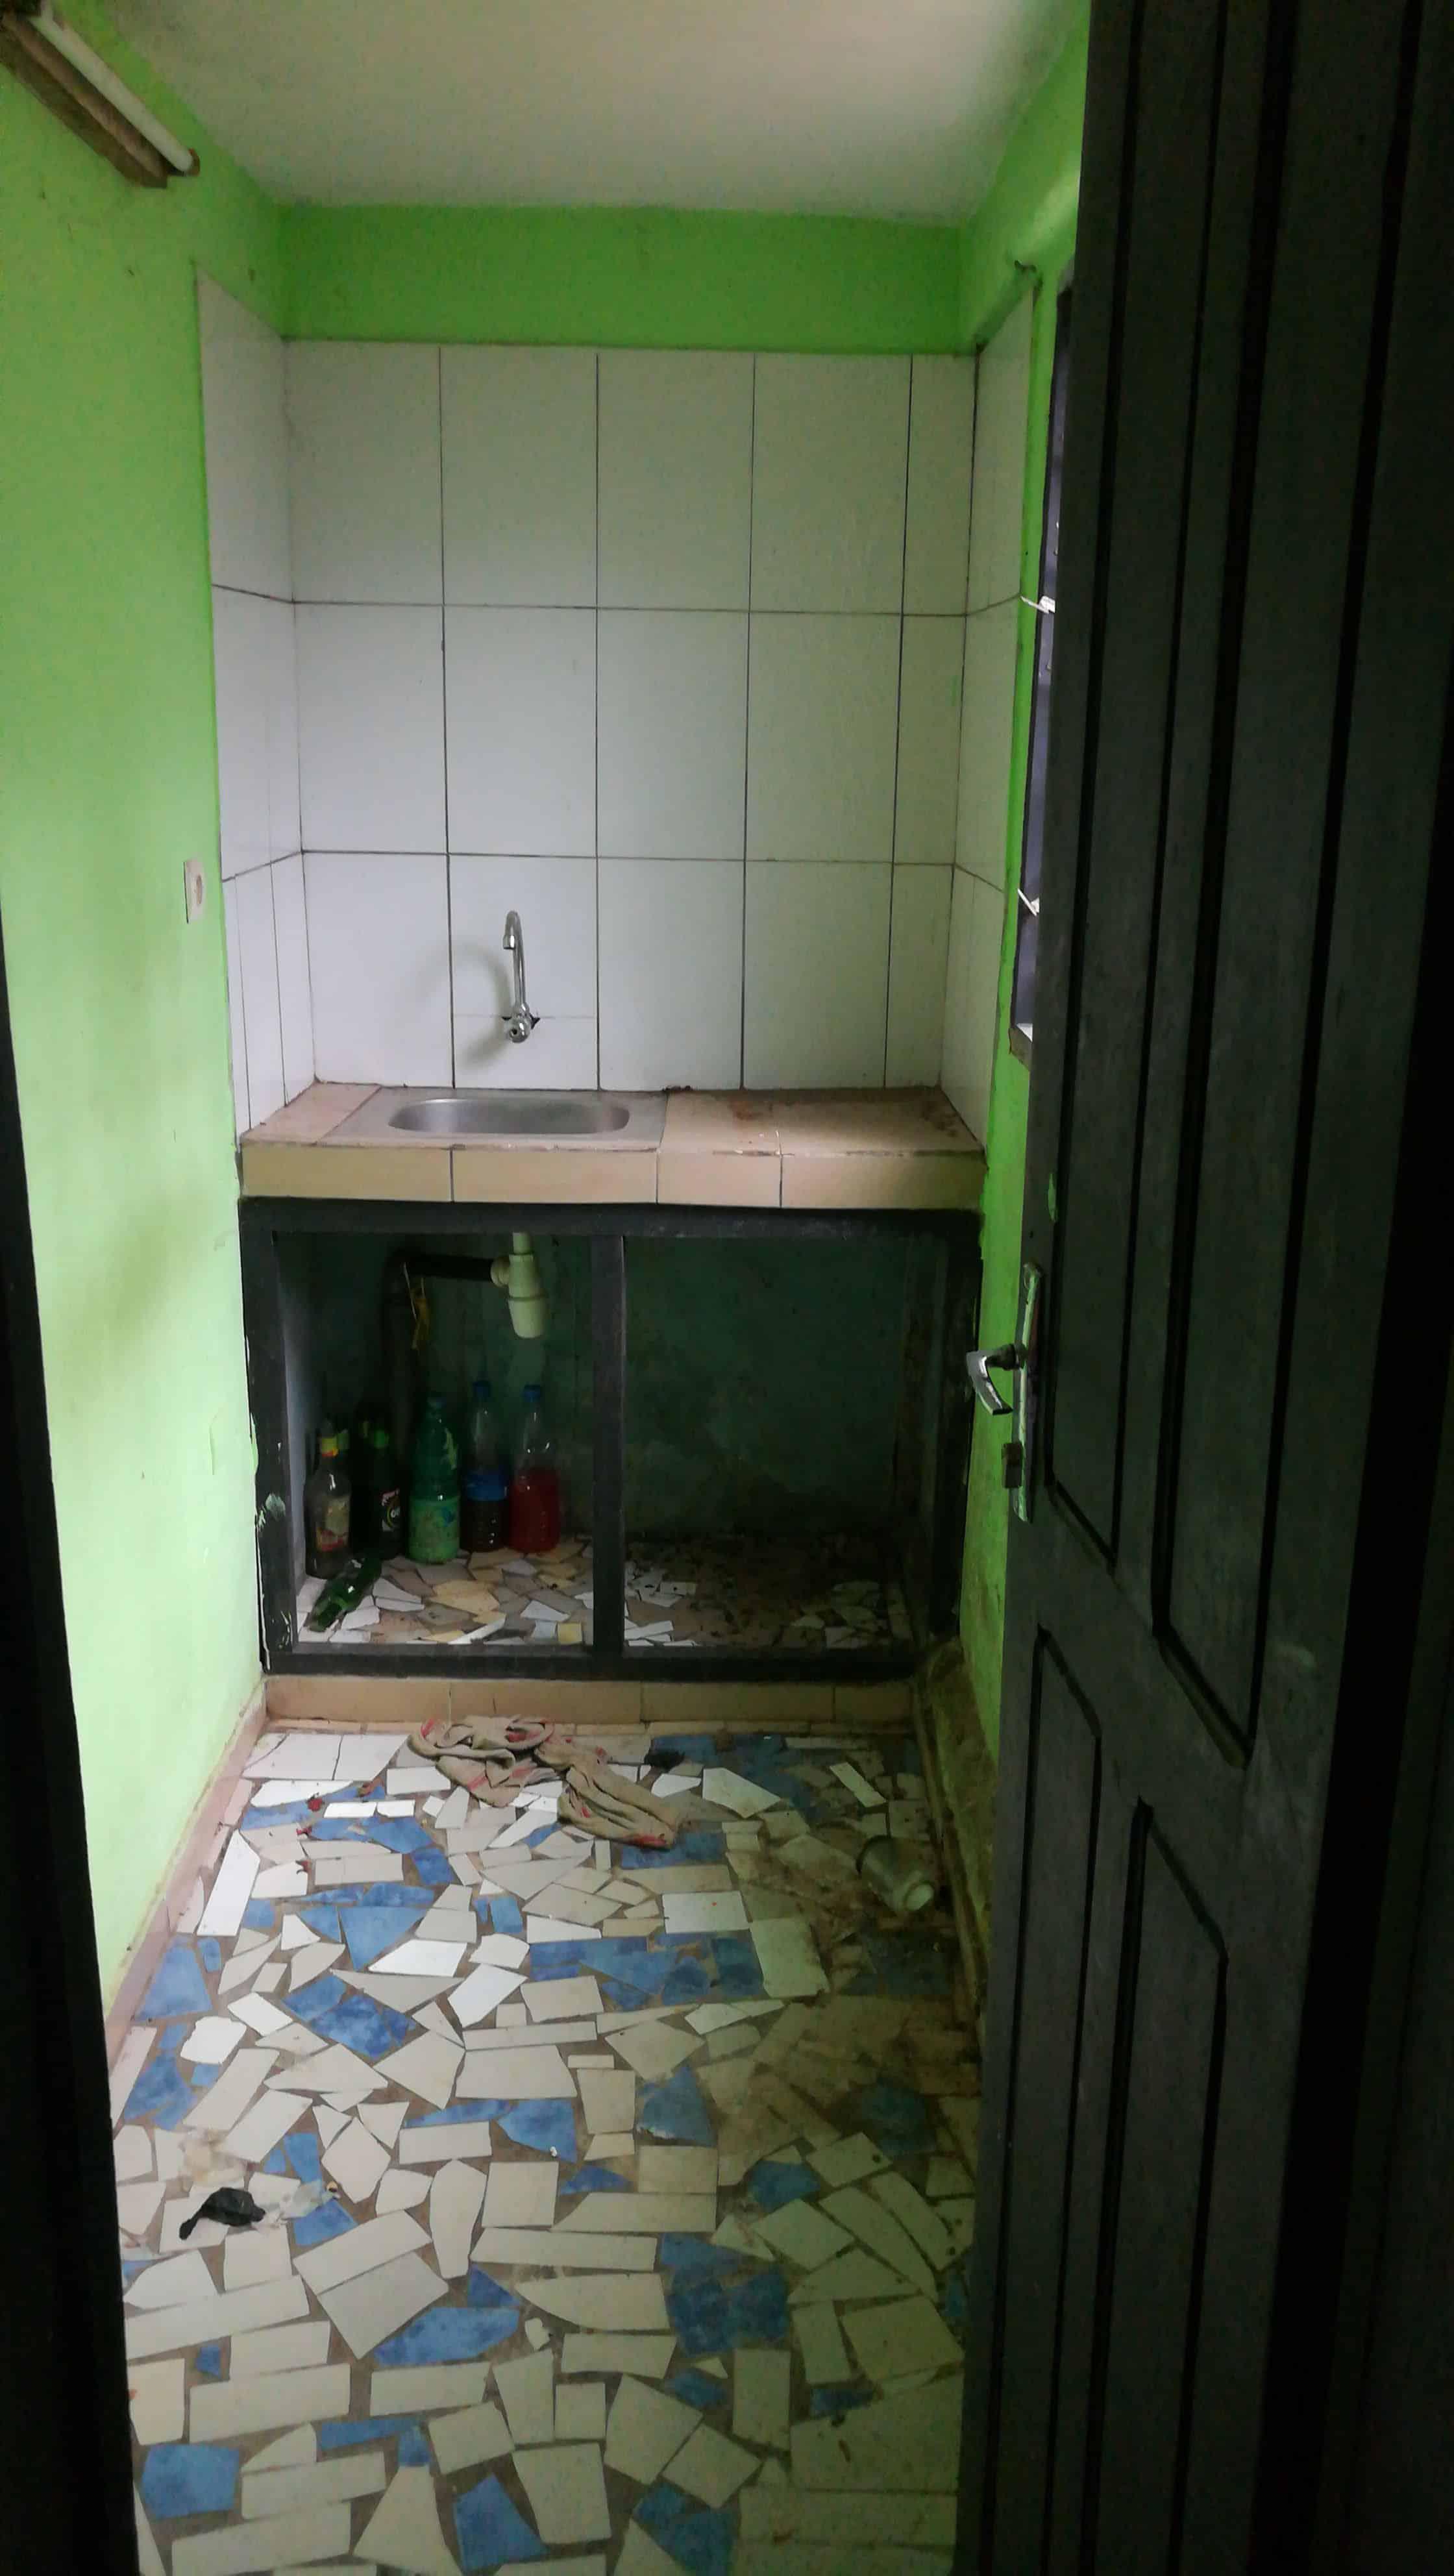 Apartment to rent - Douala, Logpom, Derrière andem - 1 living room(s), 1 bedroom(s), 1 bathroom(s) - 50 000 FCFA / month